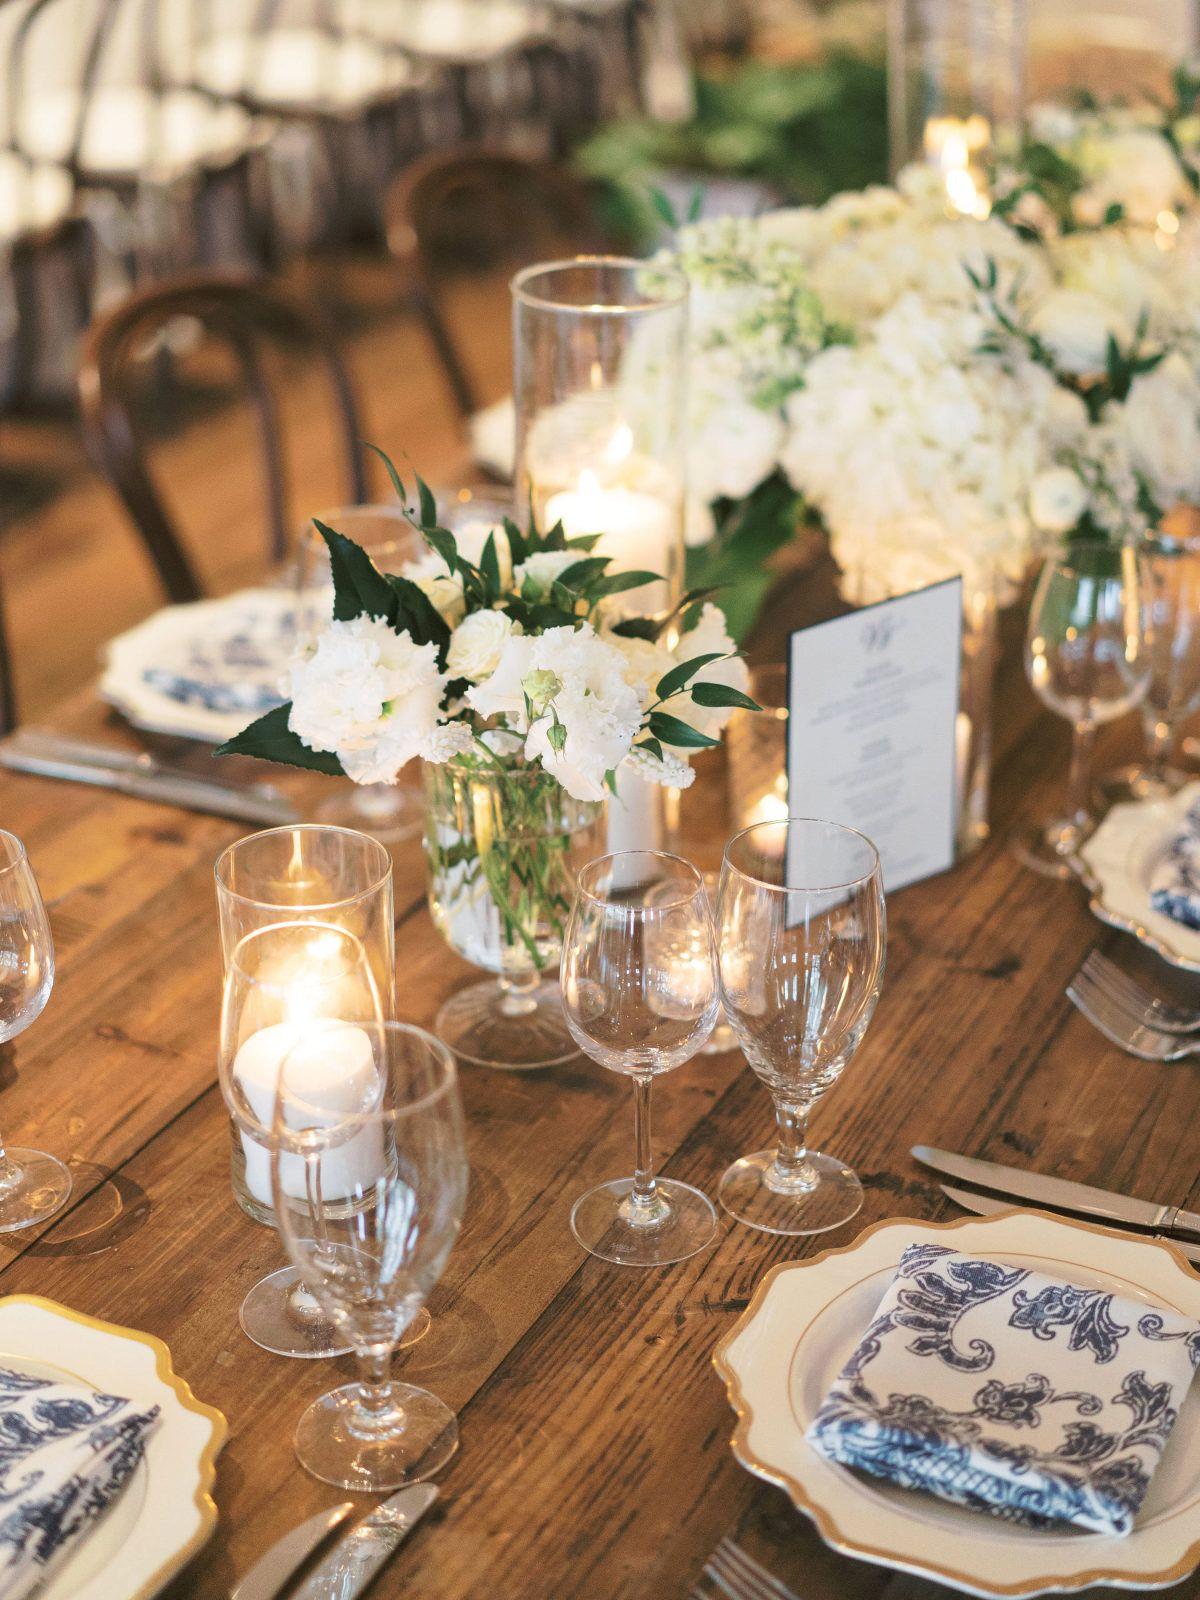 A classic wedding at kiawah island sanctuary resort on the